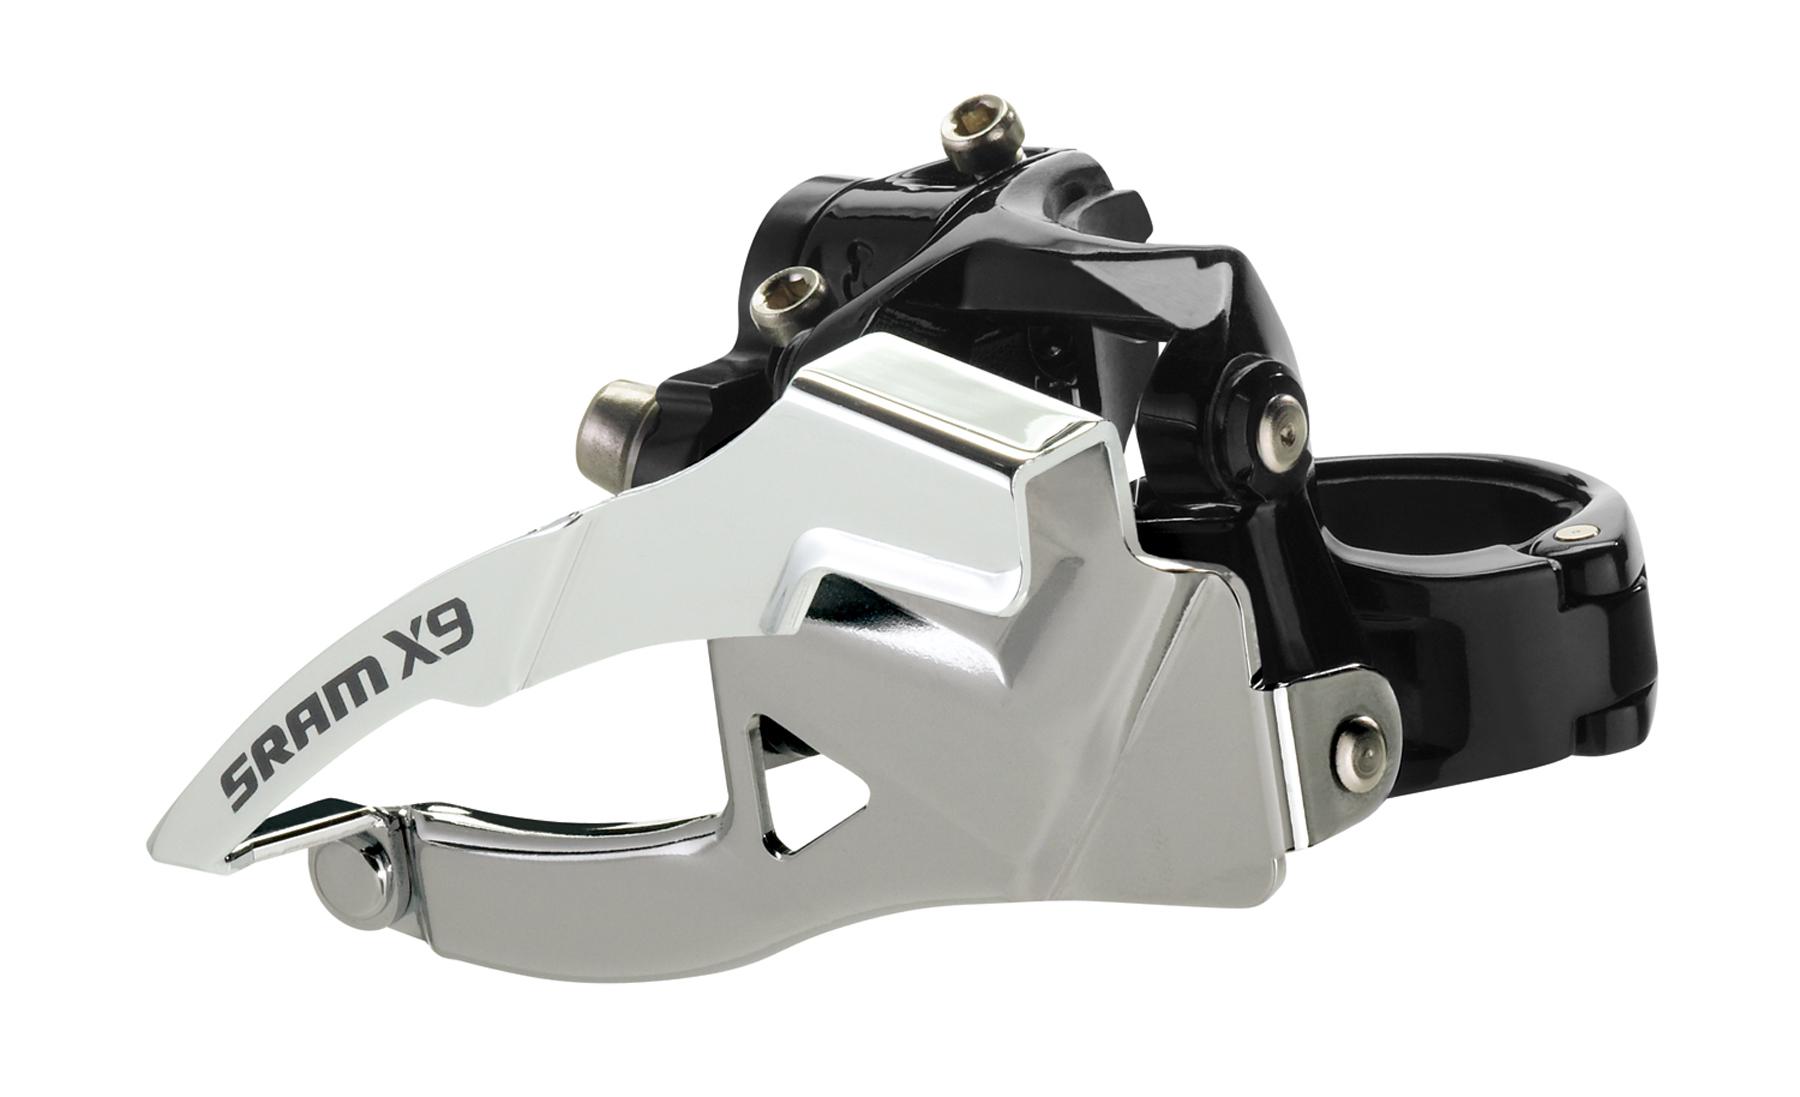 SRAM Front derailleur X9 Low clamp Ø31,8/34,9 mm 3x10 speed Top pull | Front derailleur